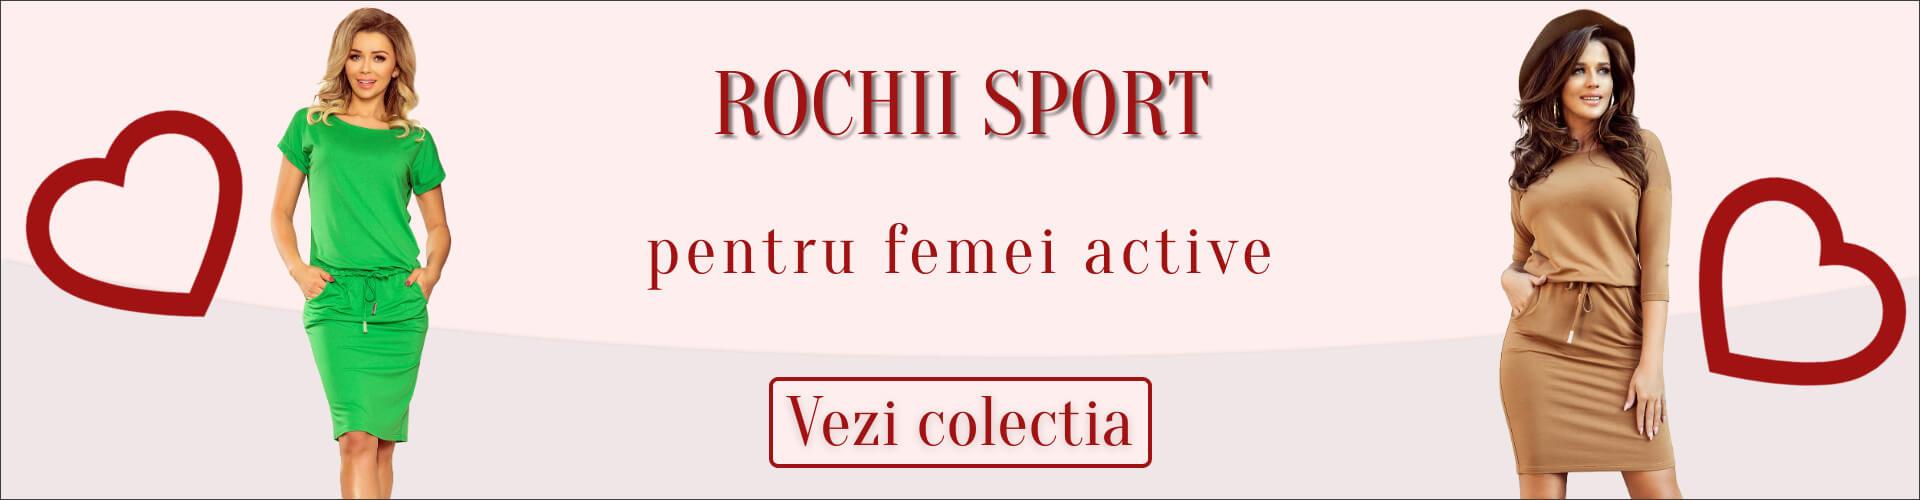 Rochii sport